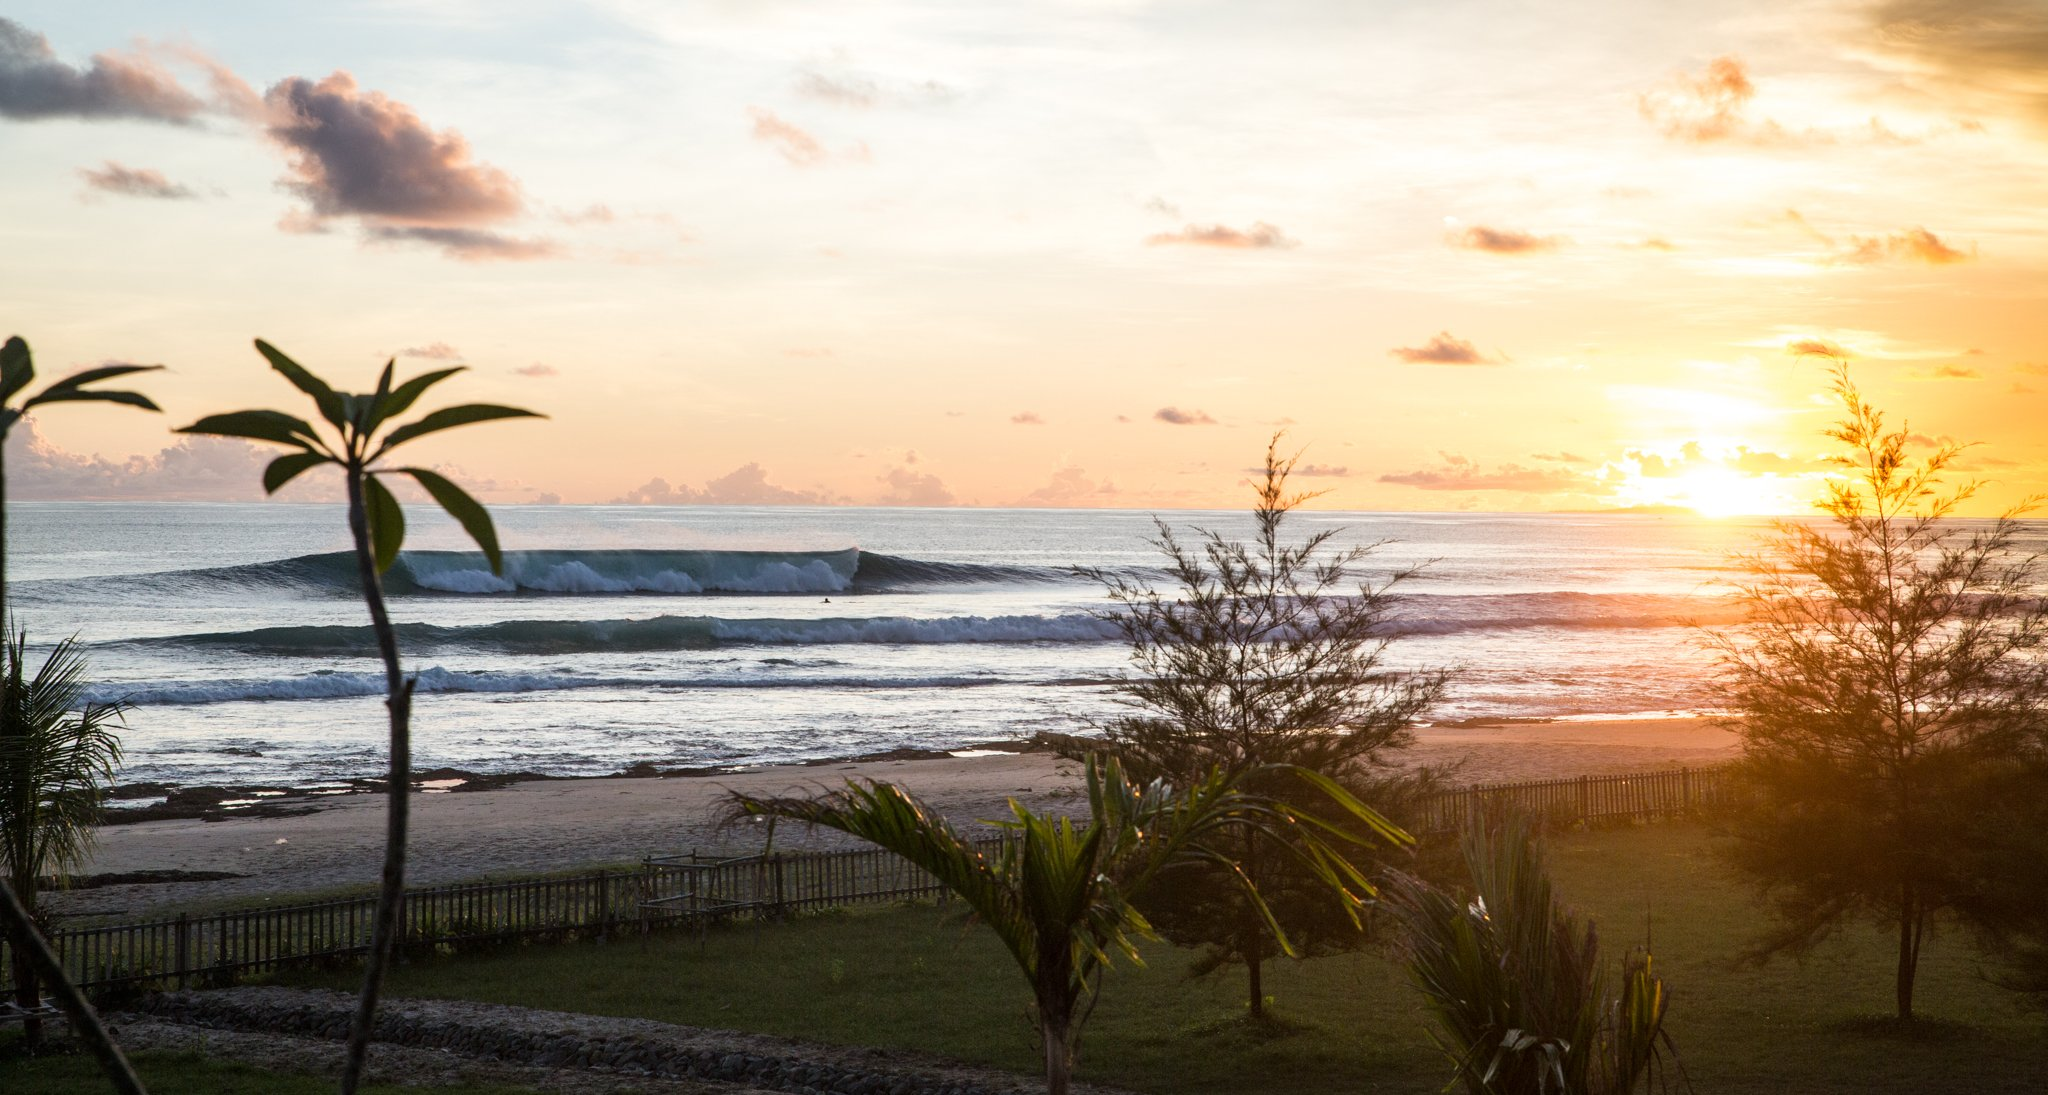 Simeulue Island Surf Spot: The Peak in front of Mahi-Mahi Bungalows